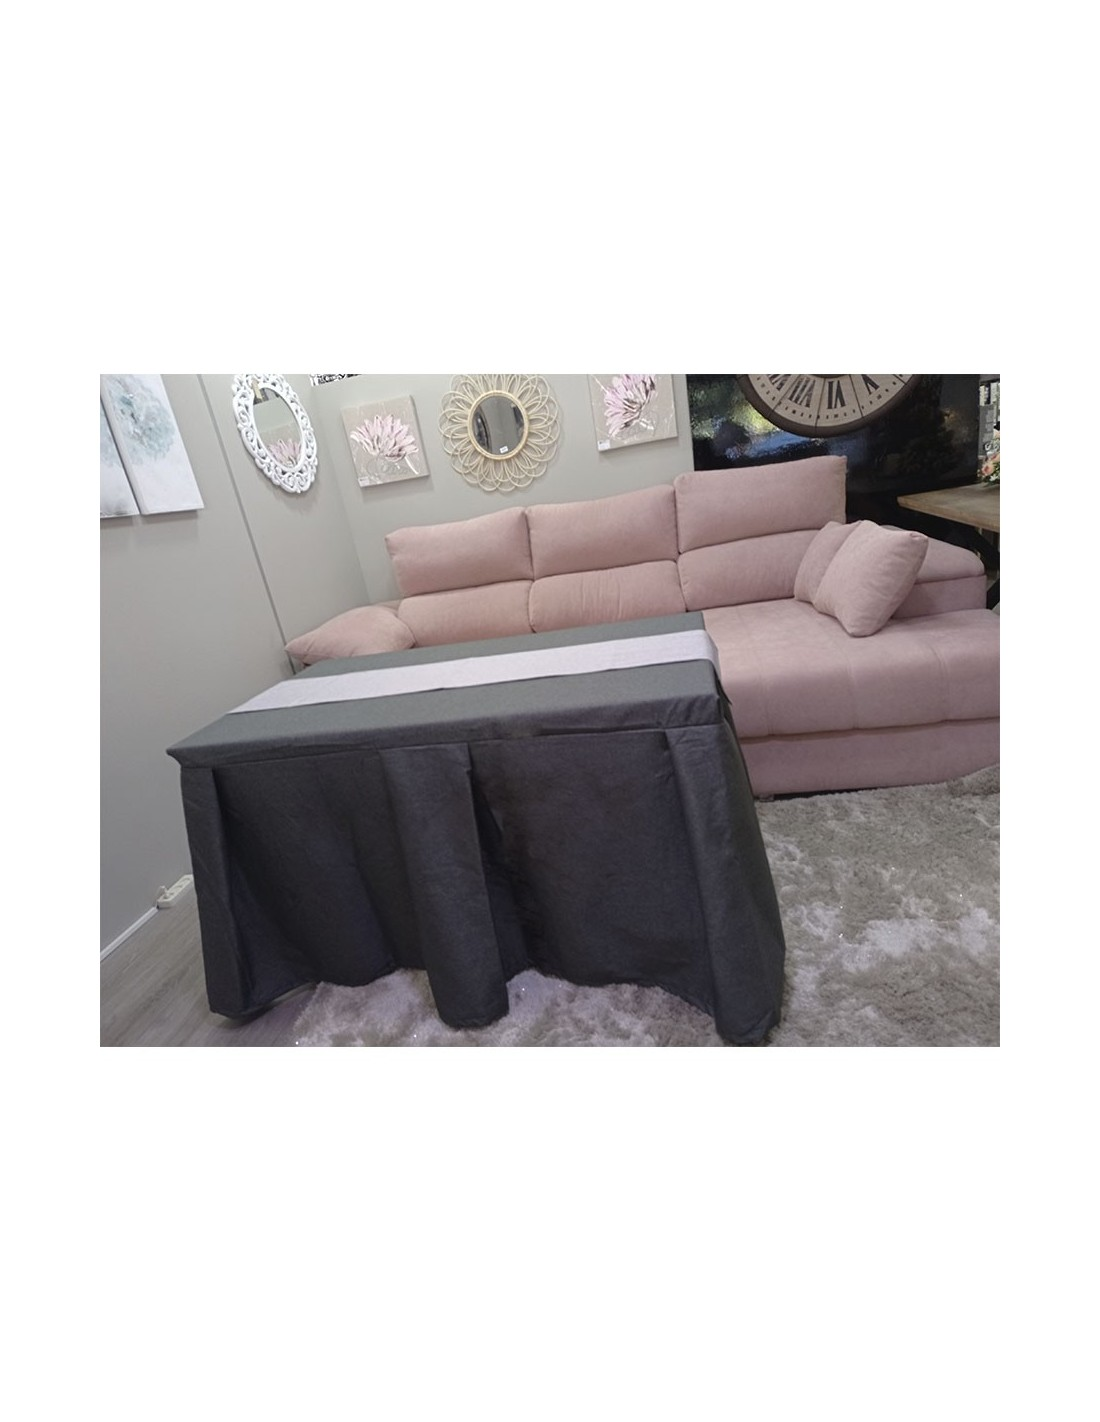 Sofá 3 plazas 2 asientos extraibles-reclinables